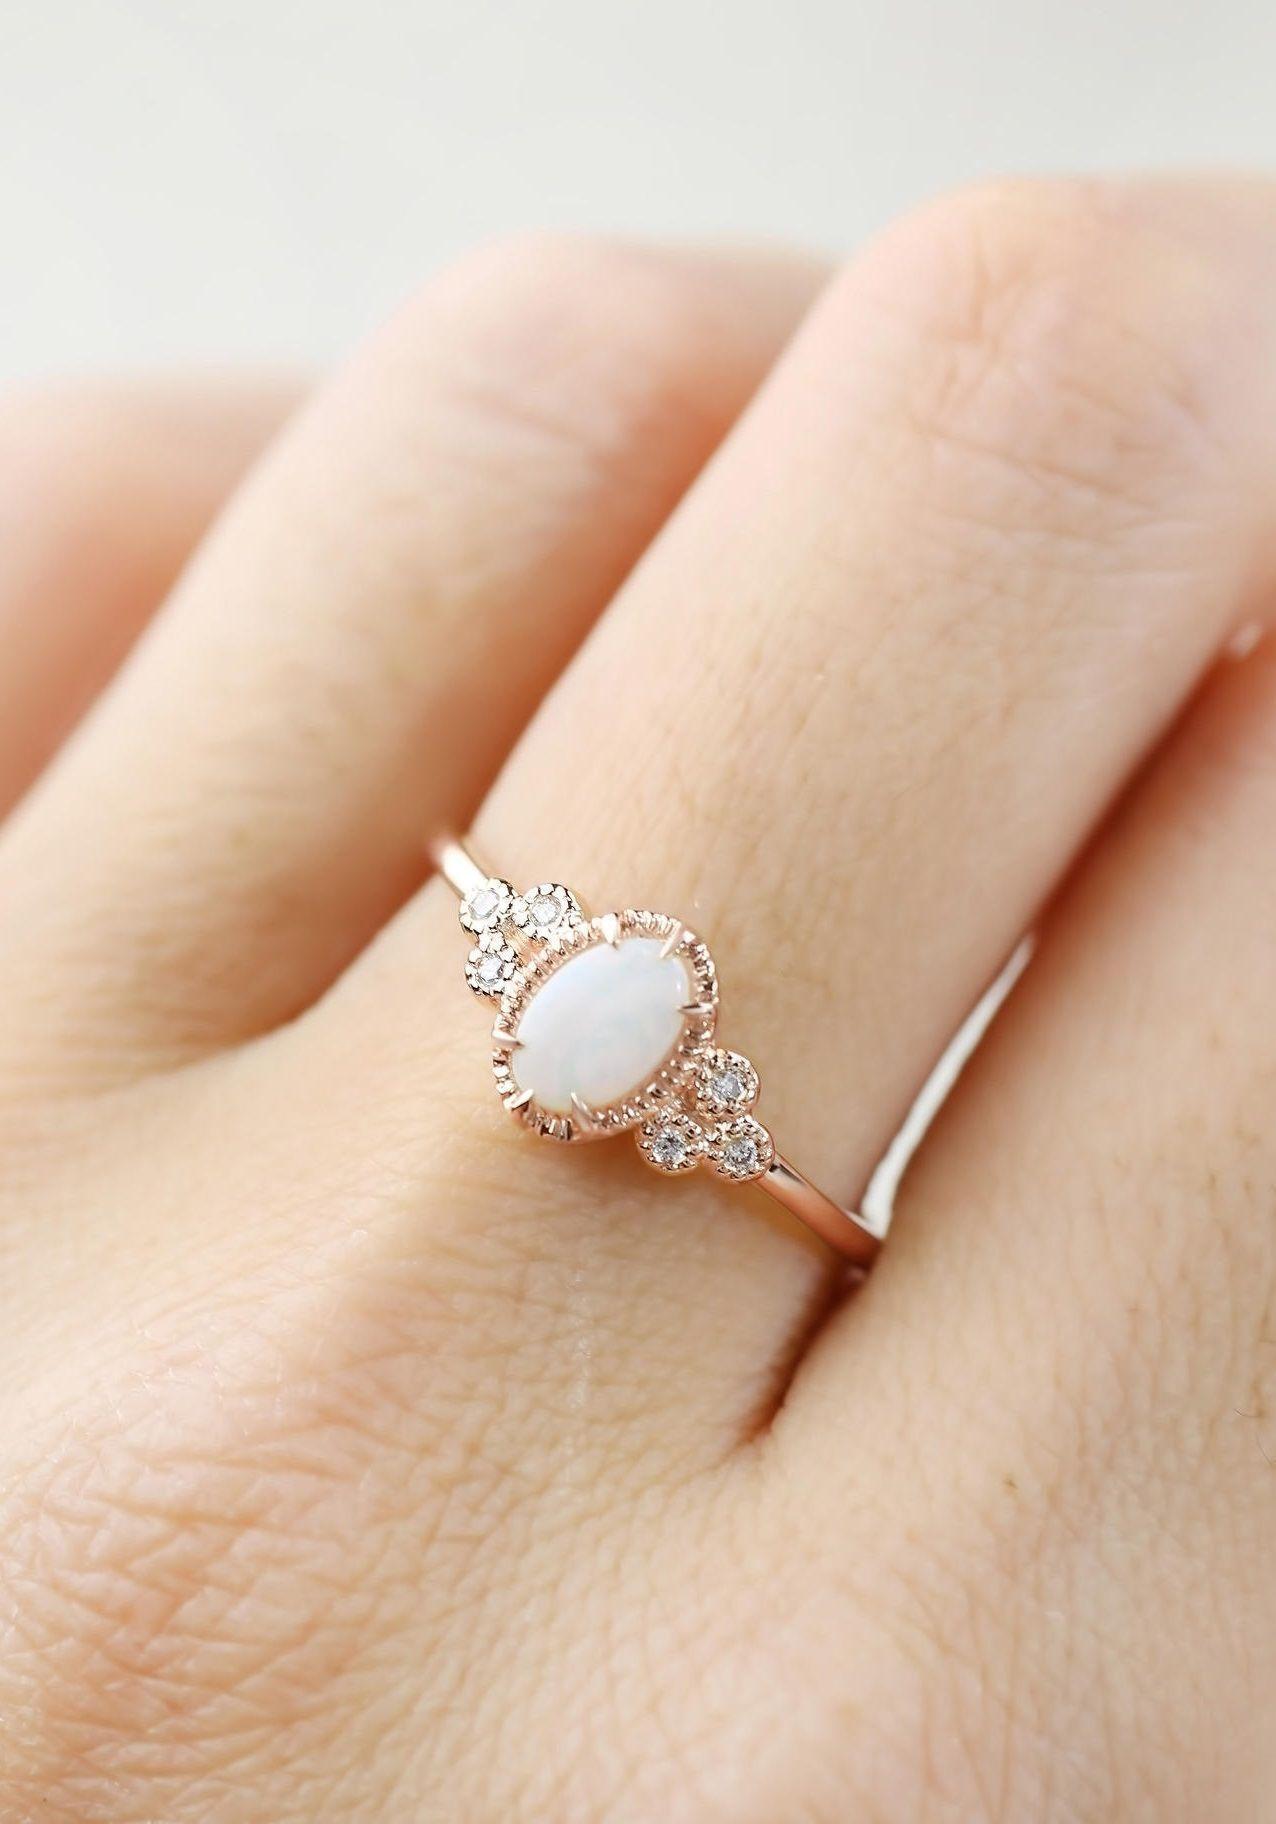 Opal engagement ring vintage engagement ring rose gold